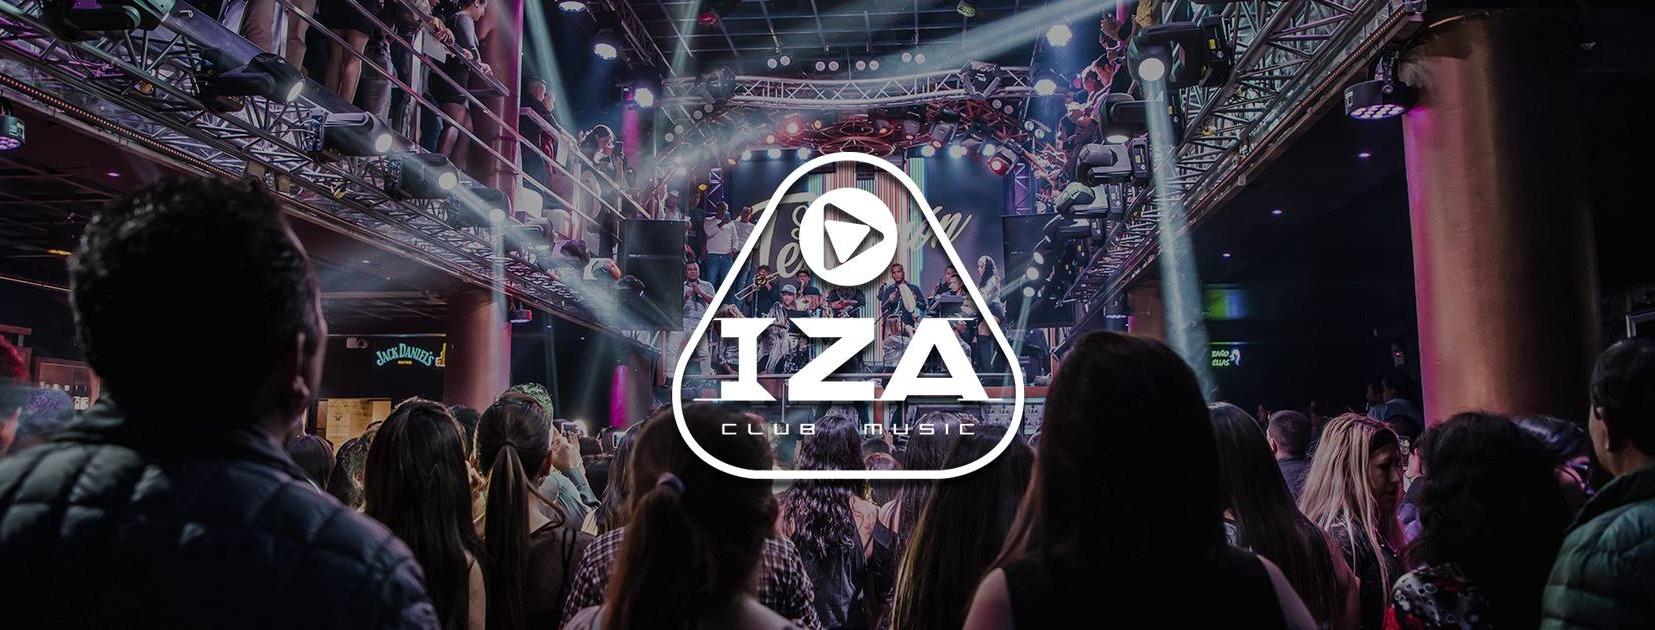 Portada IZA Club